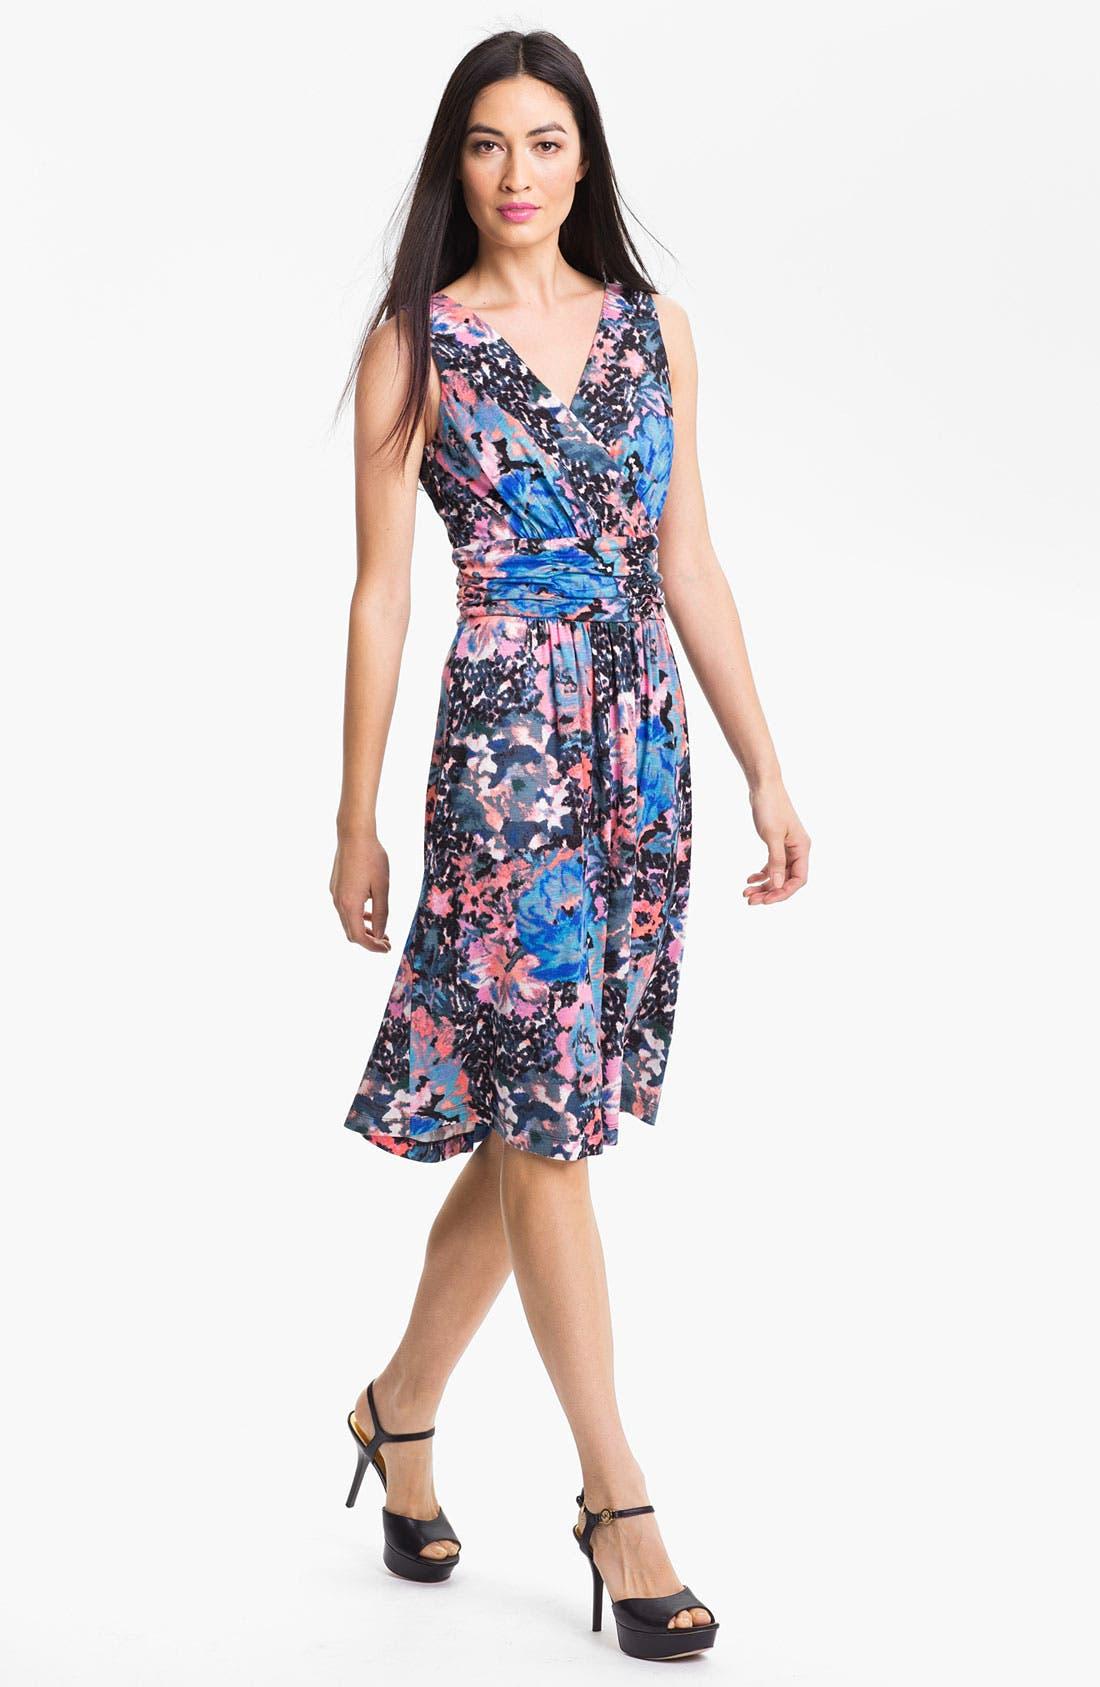 Main Image - Nic + Zoe 'Nocturnal Garden' Dress